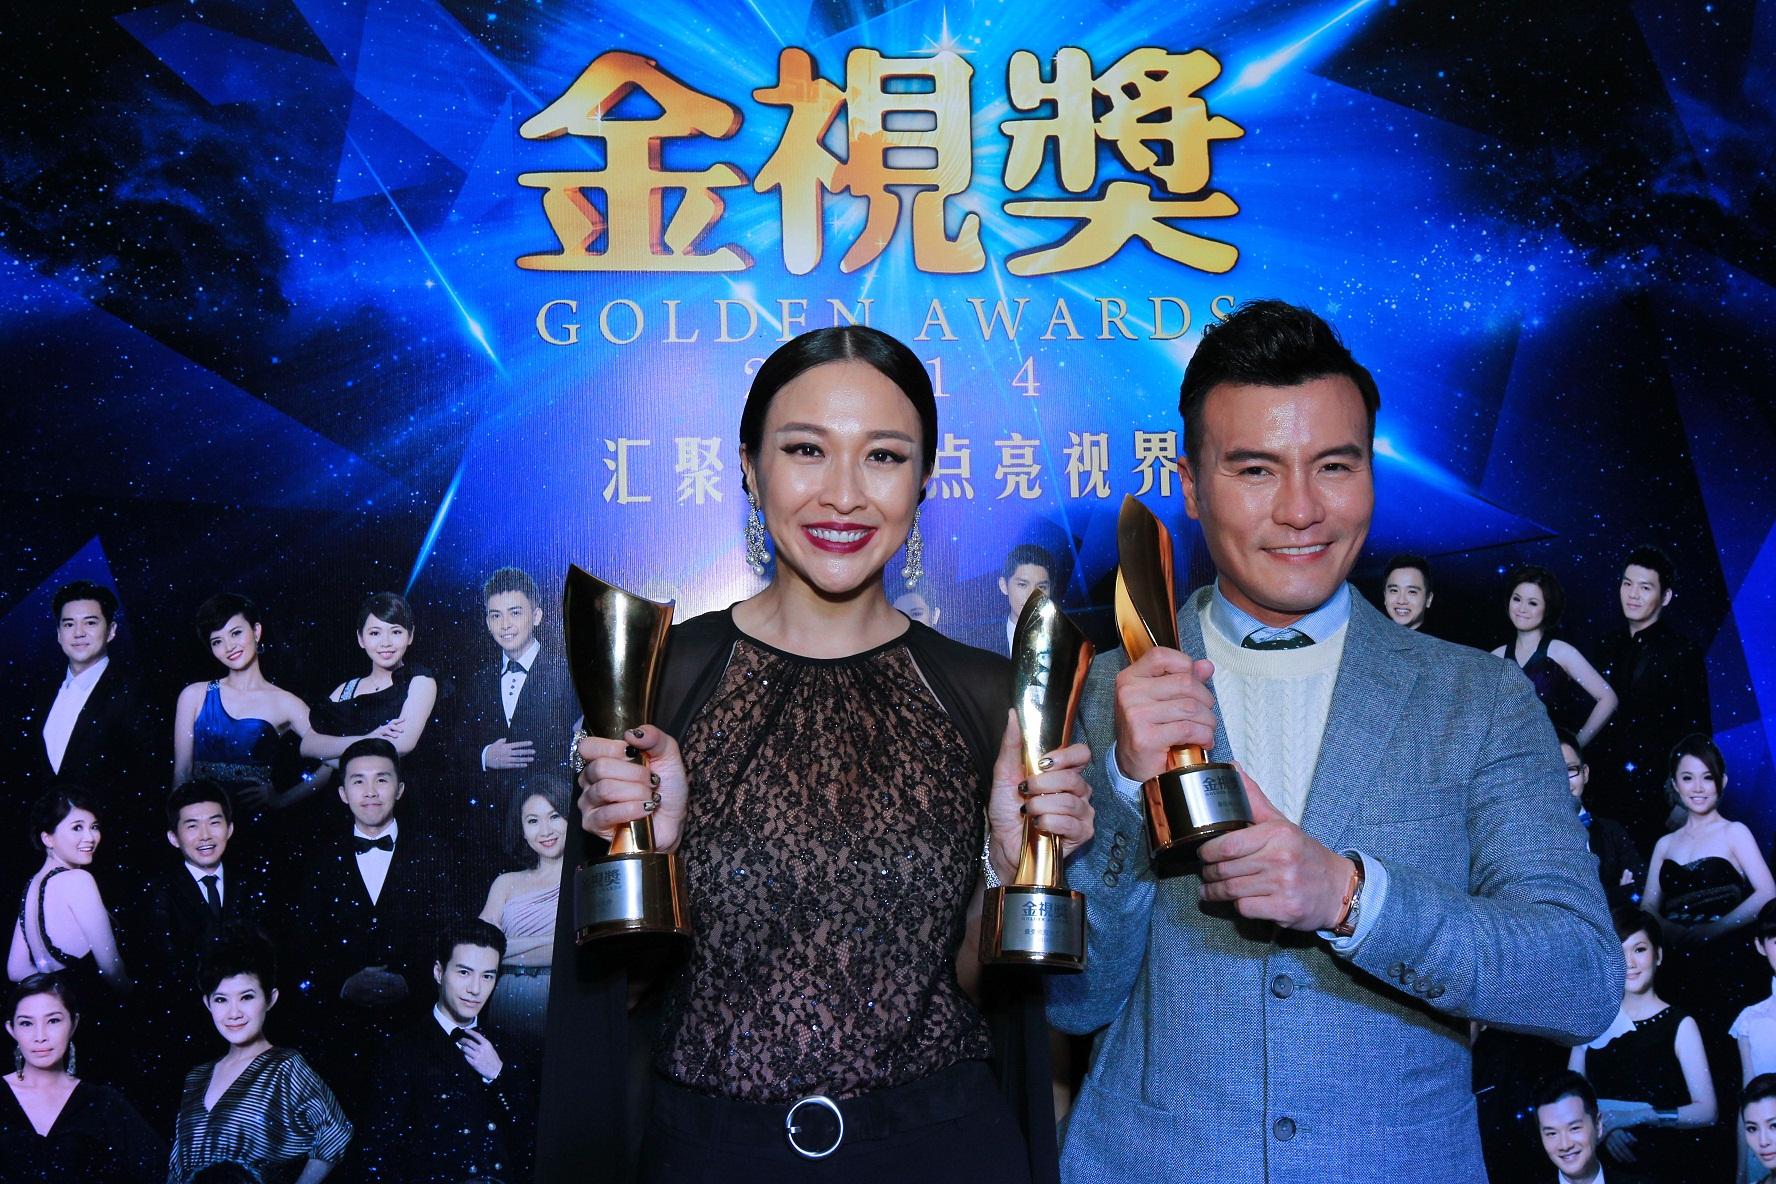 Pelakon Lelaki & Wanita Terbaik - Frederick Lee & Debbie Goh